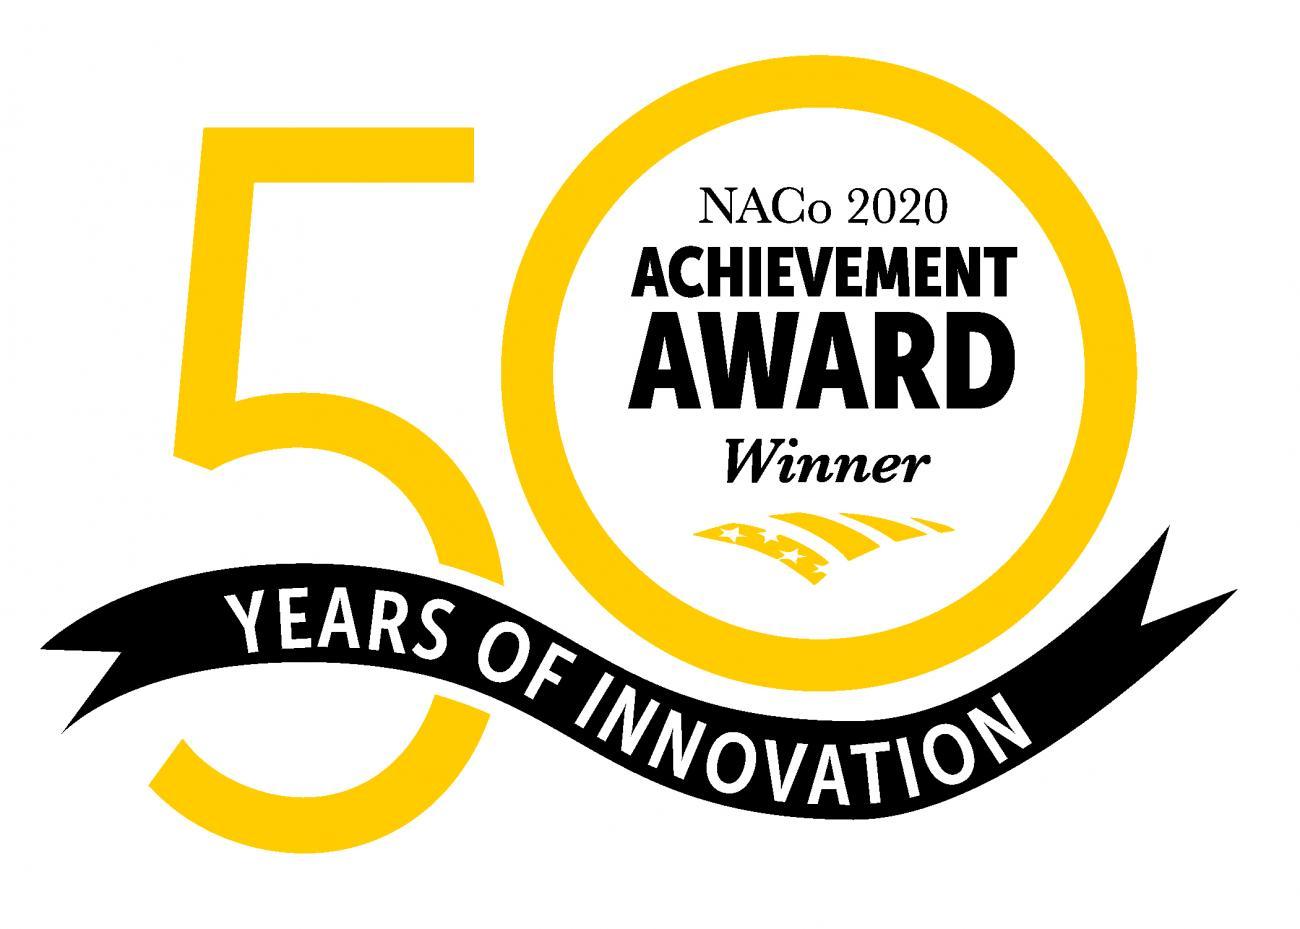 NACO Award 2020